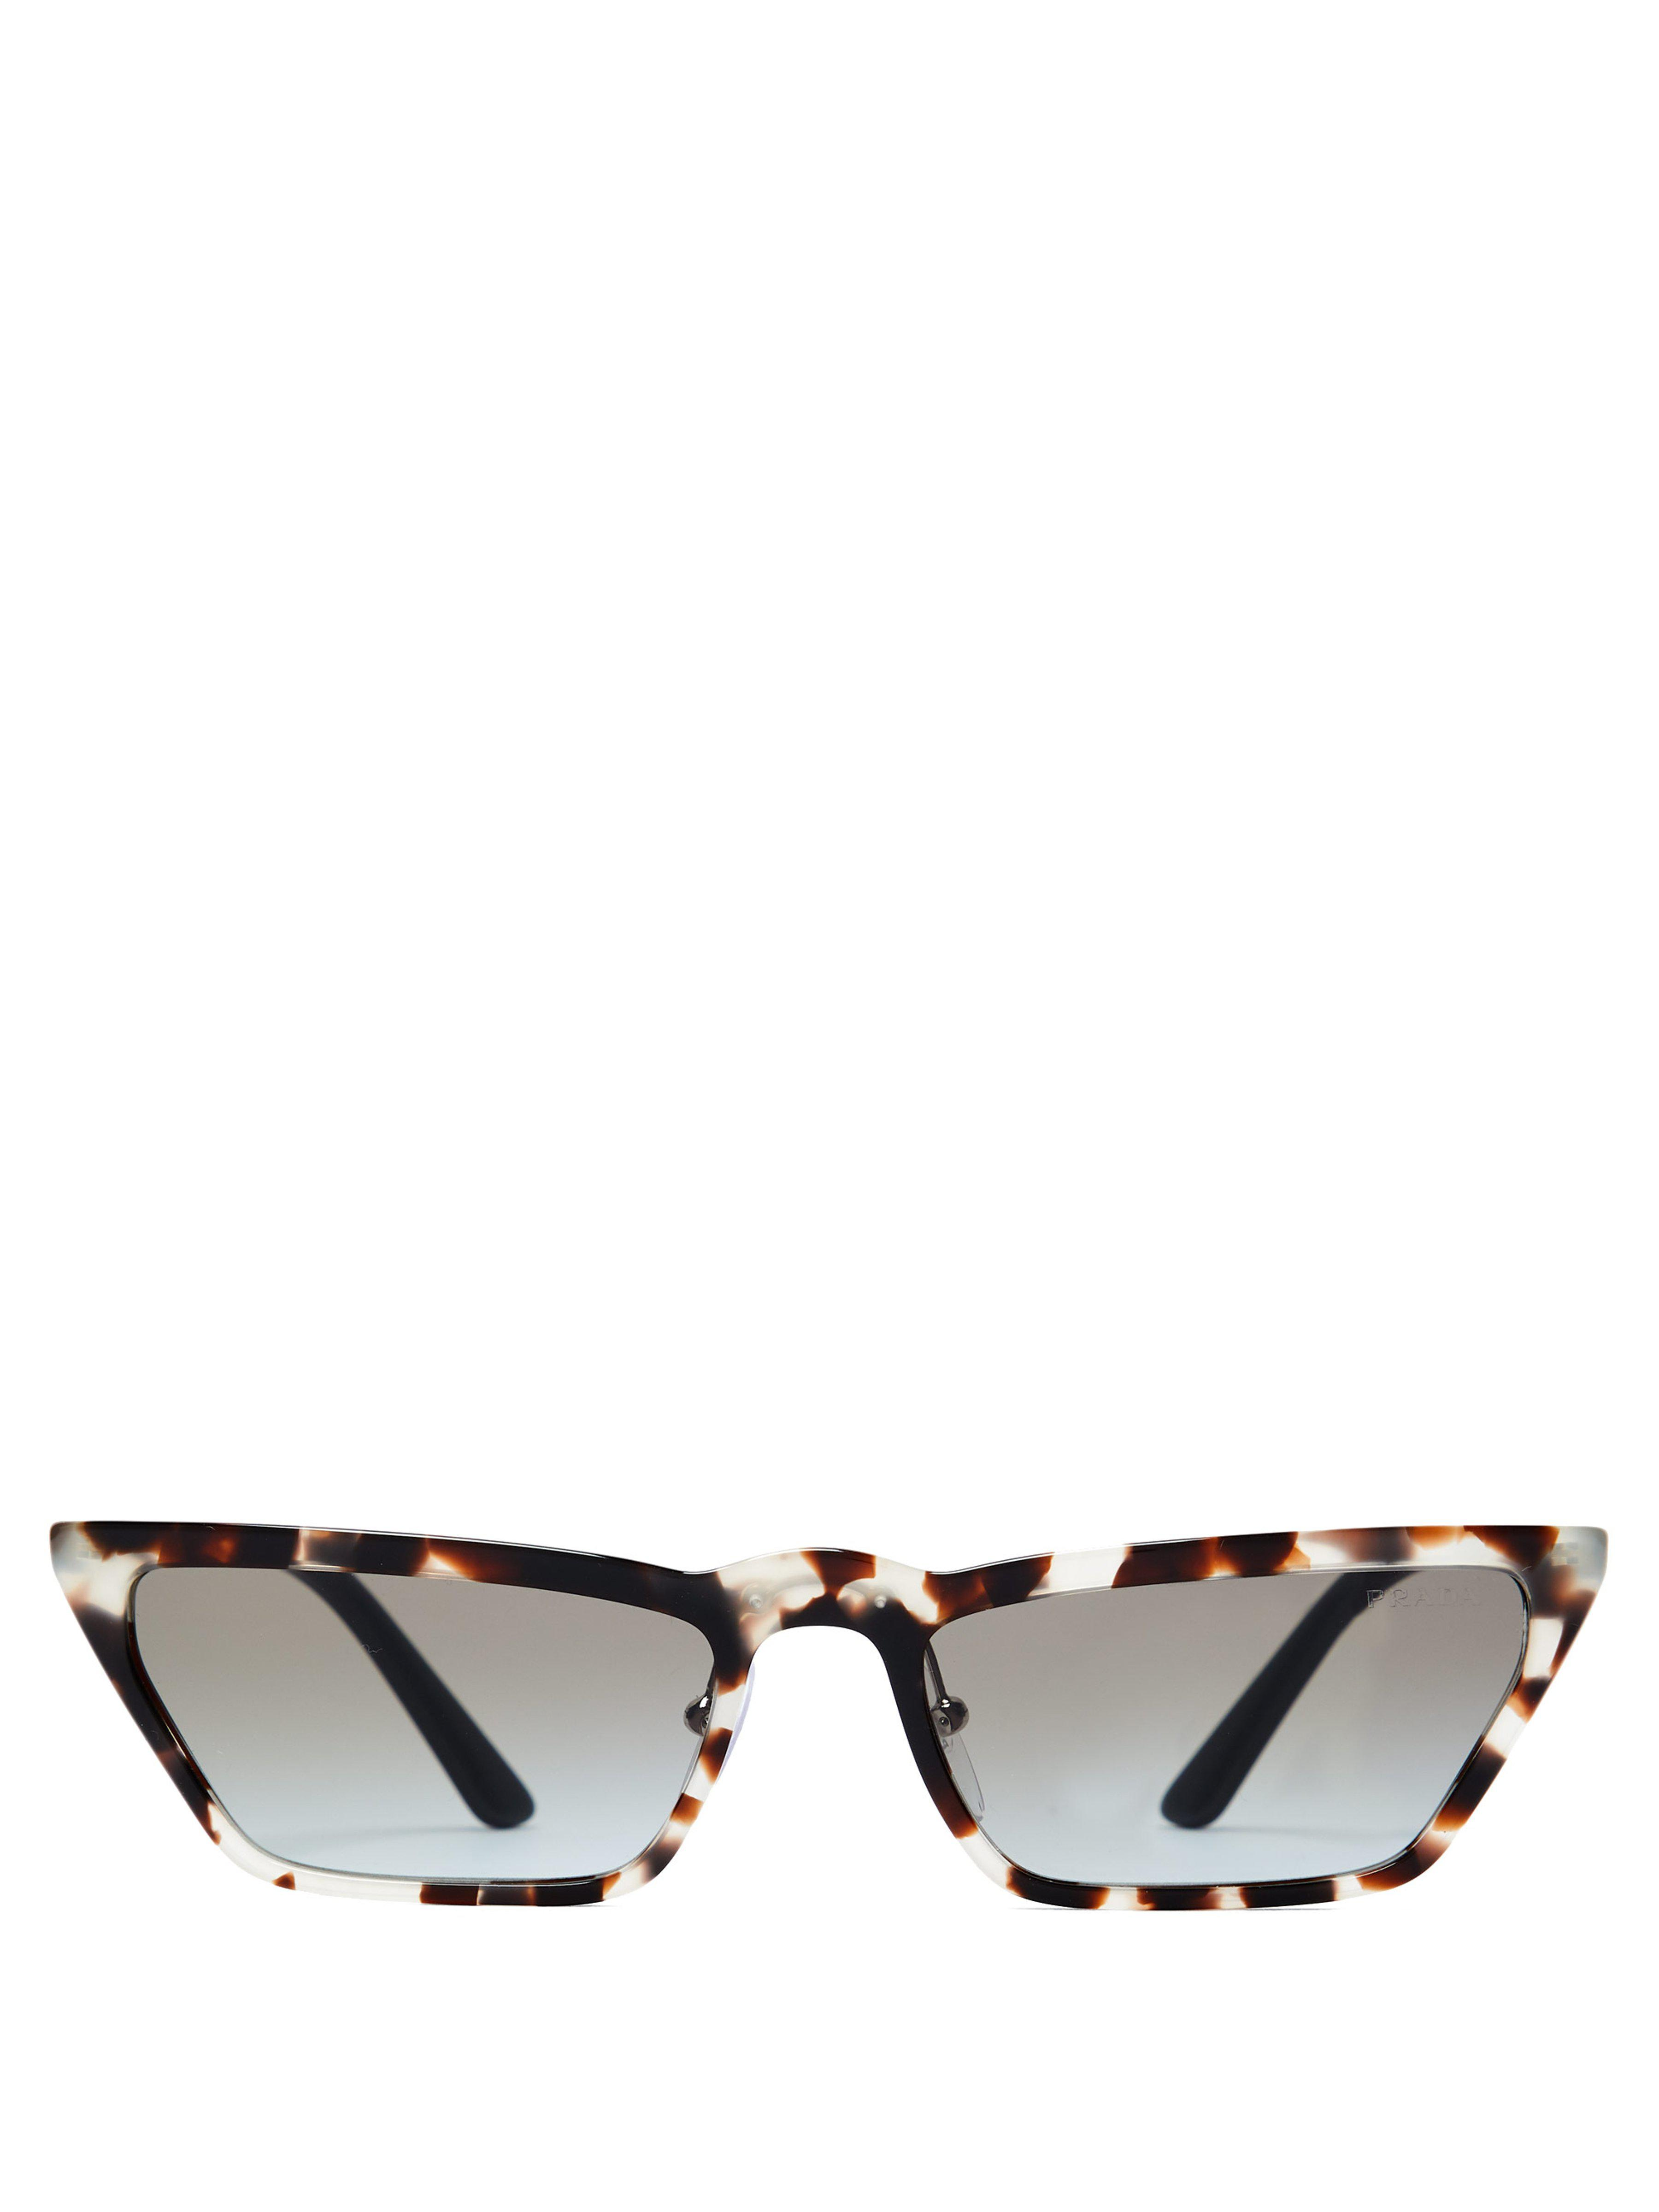 ed5743f0d8fc Prada Ultravox Rectangular Acetate Sunglasses - Lyst